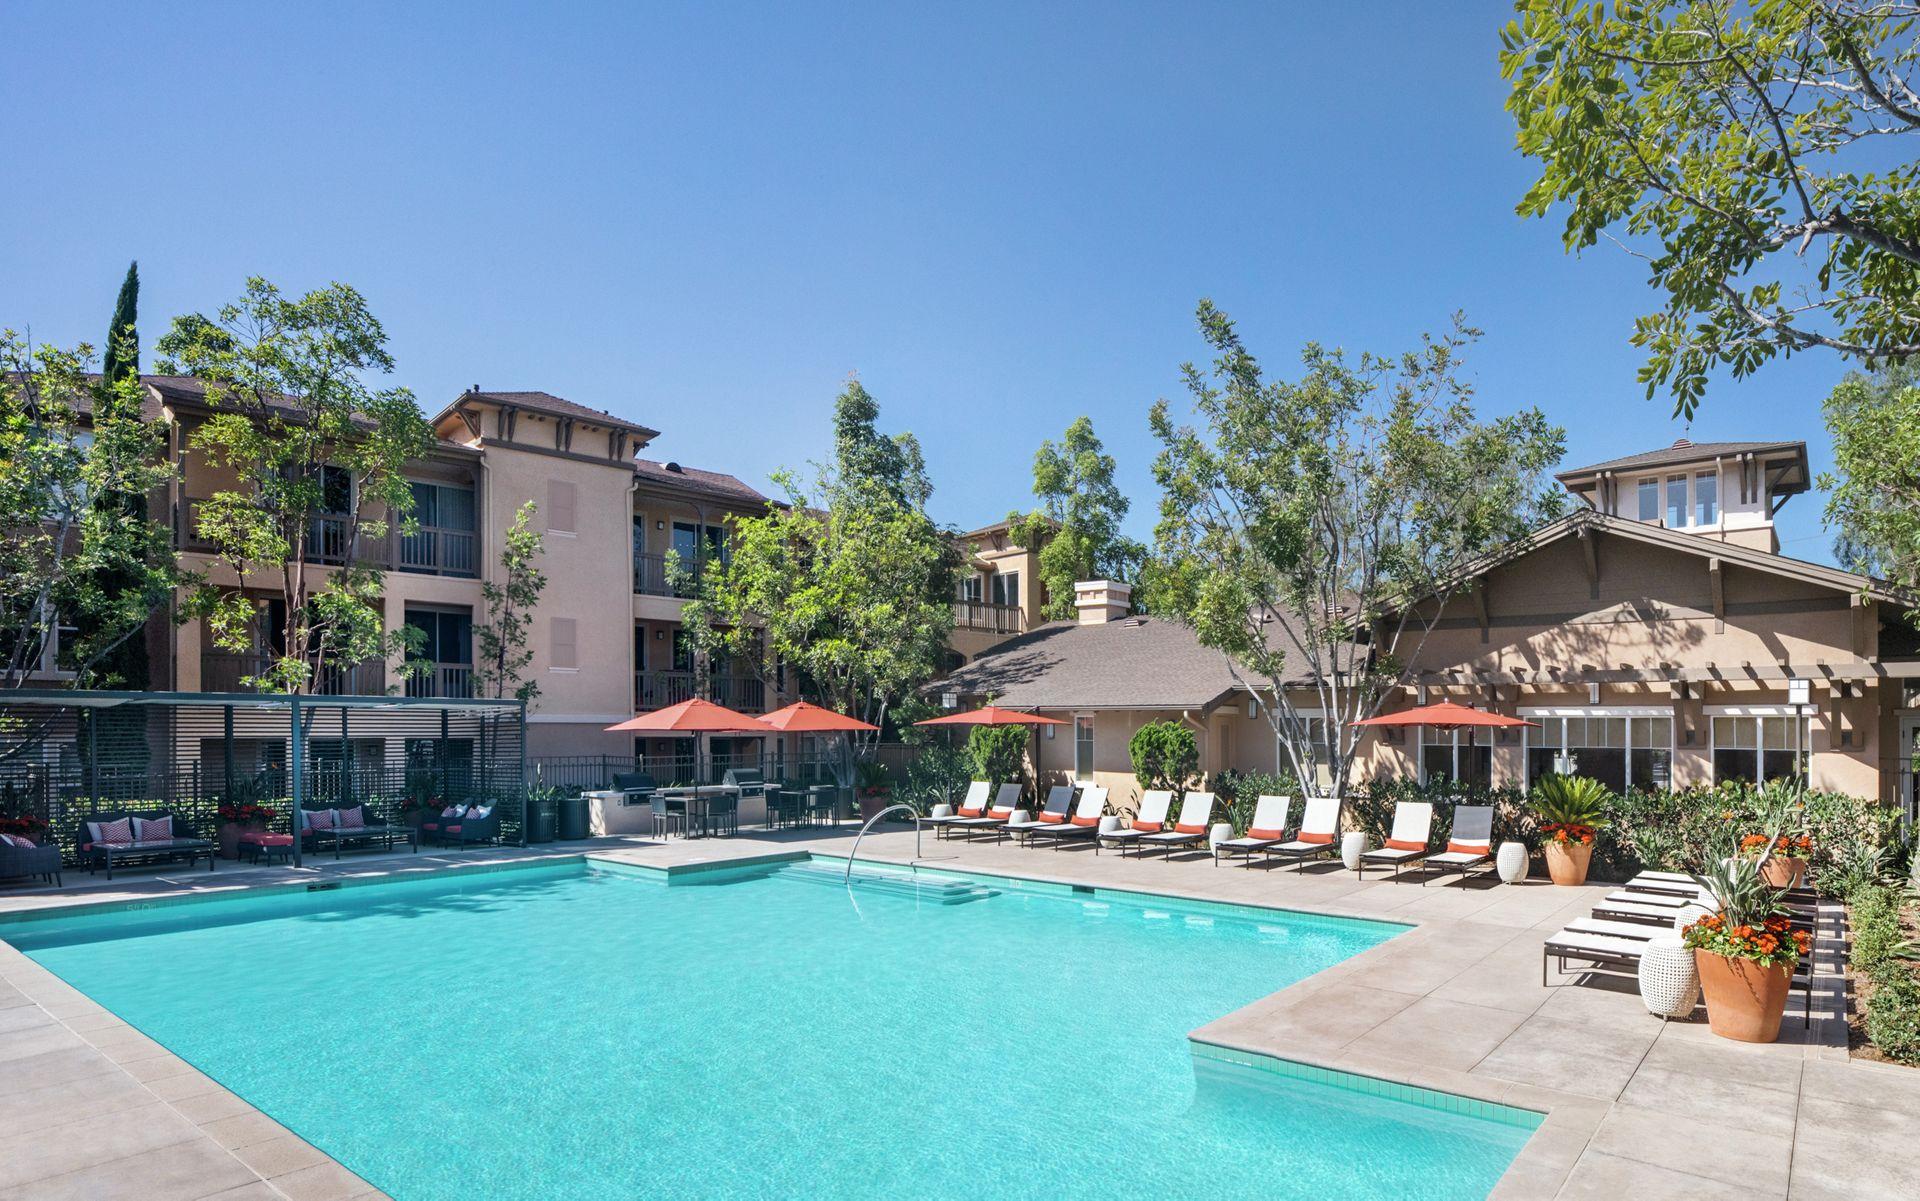 Pool view at Torrey Ridge Apartment Homes in San Diego, CA.